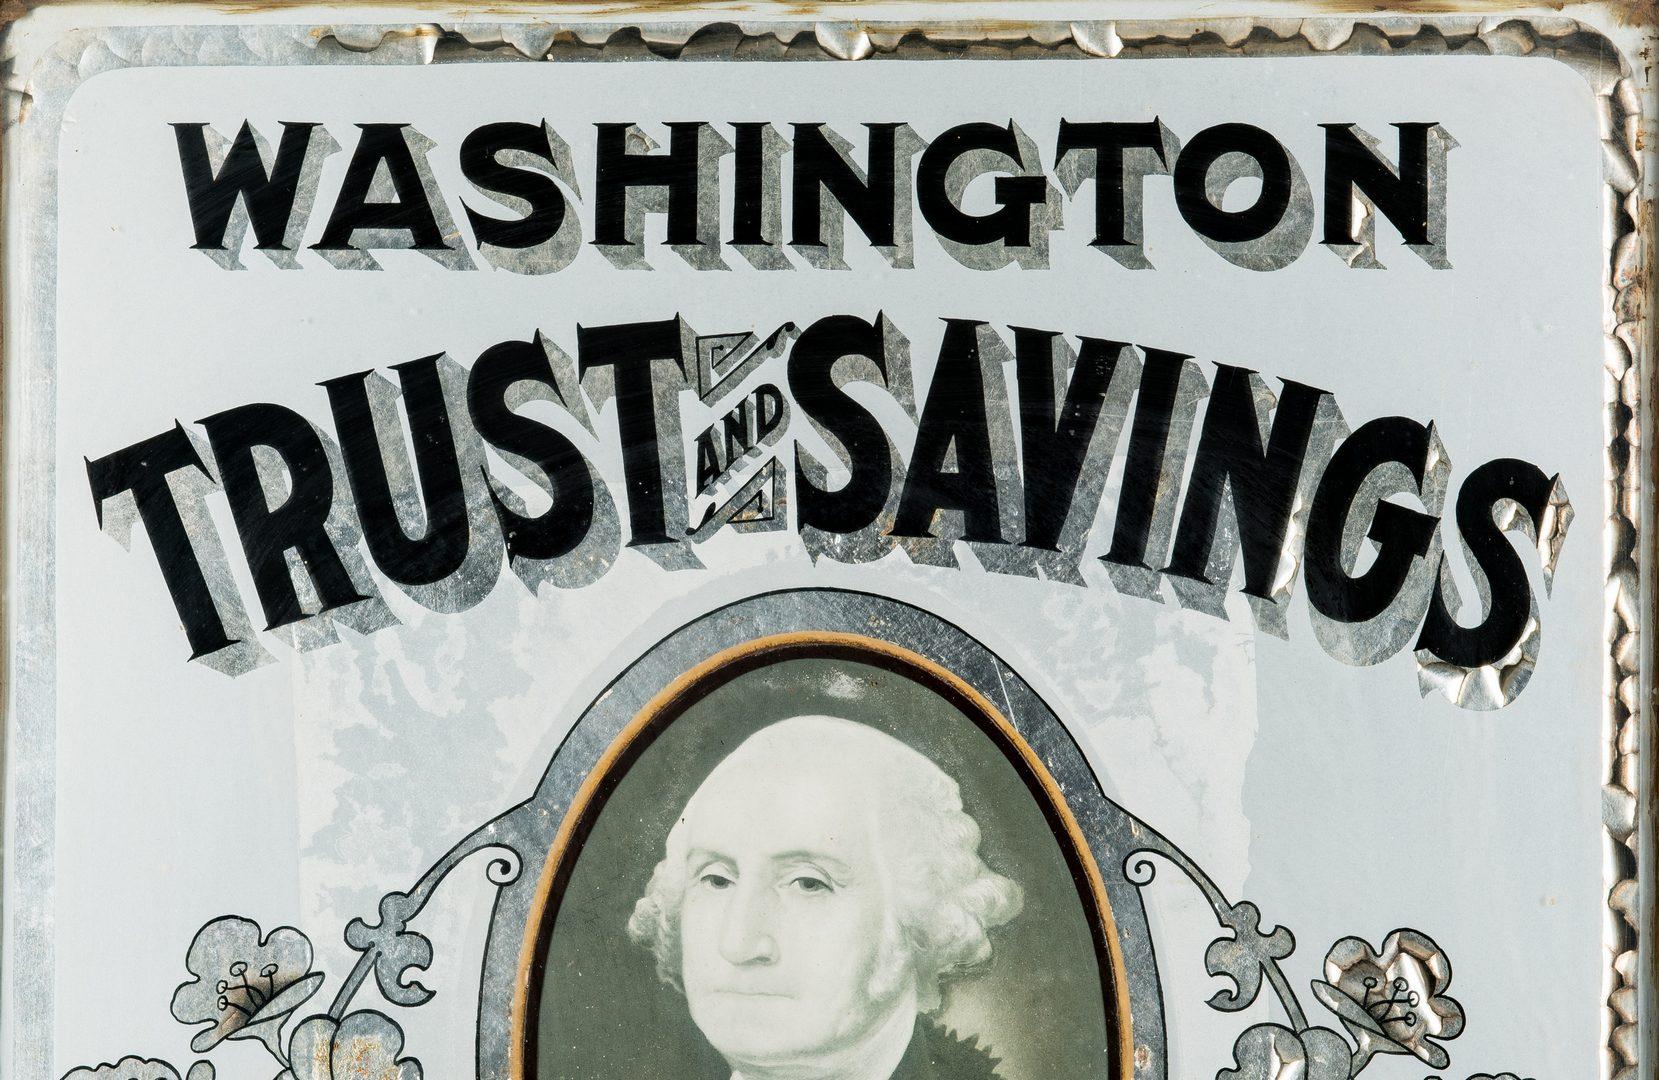 Lot 704: Washington Trust & Savings Advertising Sign